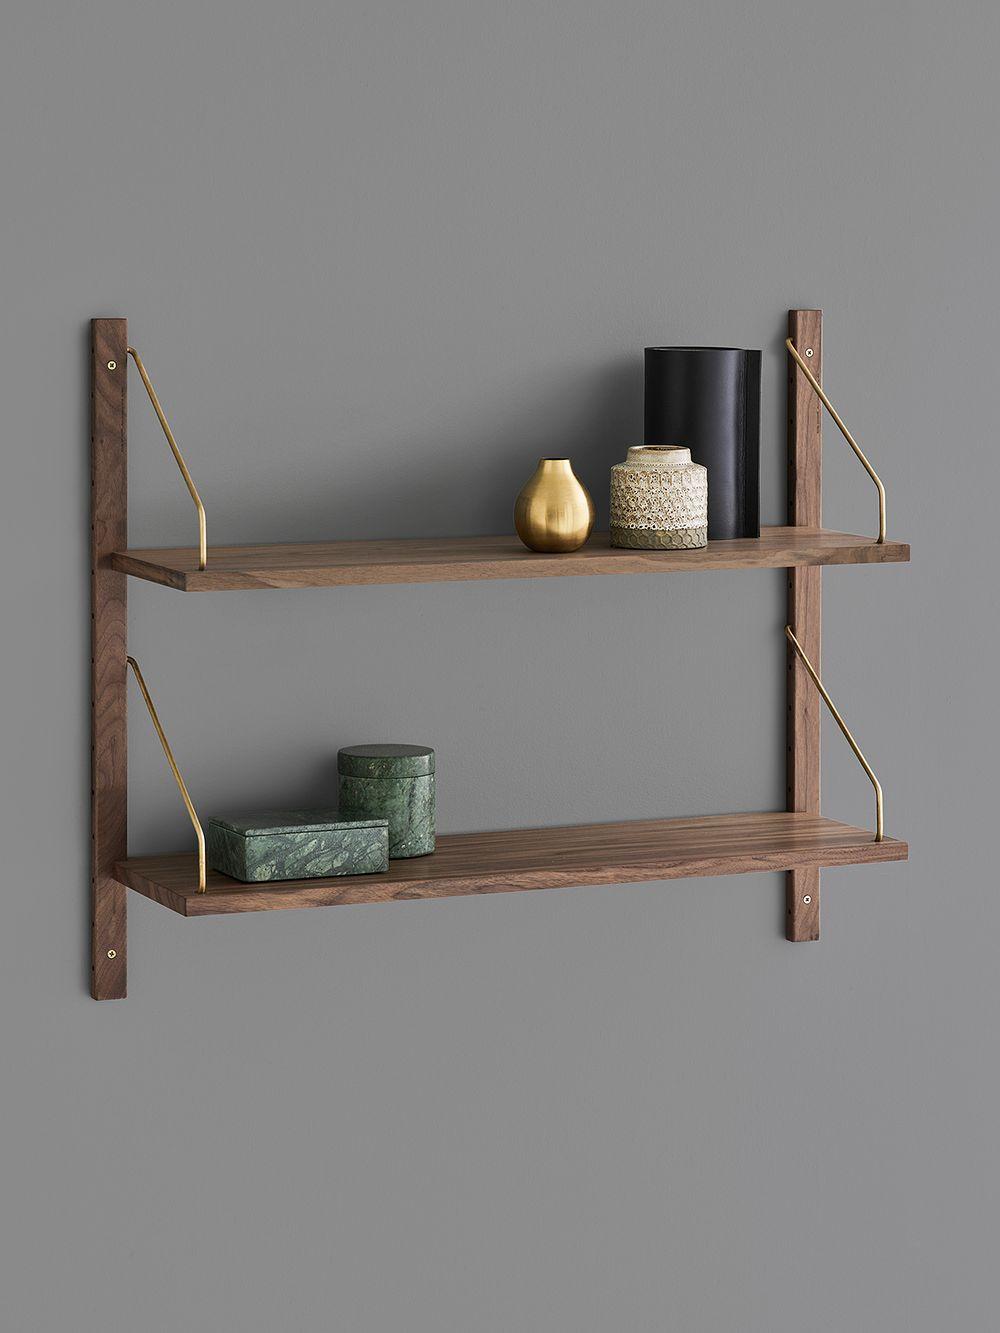 DK3 Royal System shelf